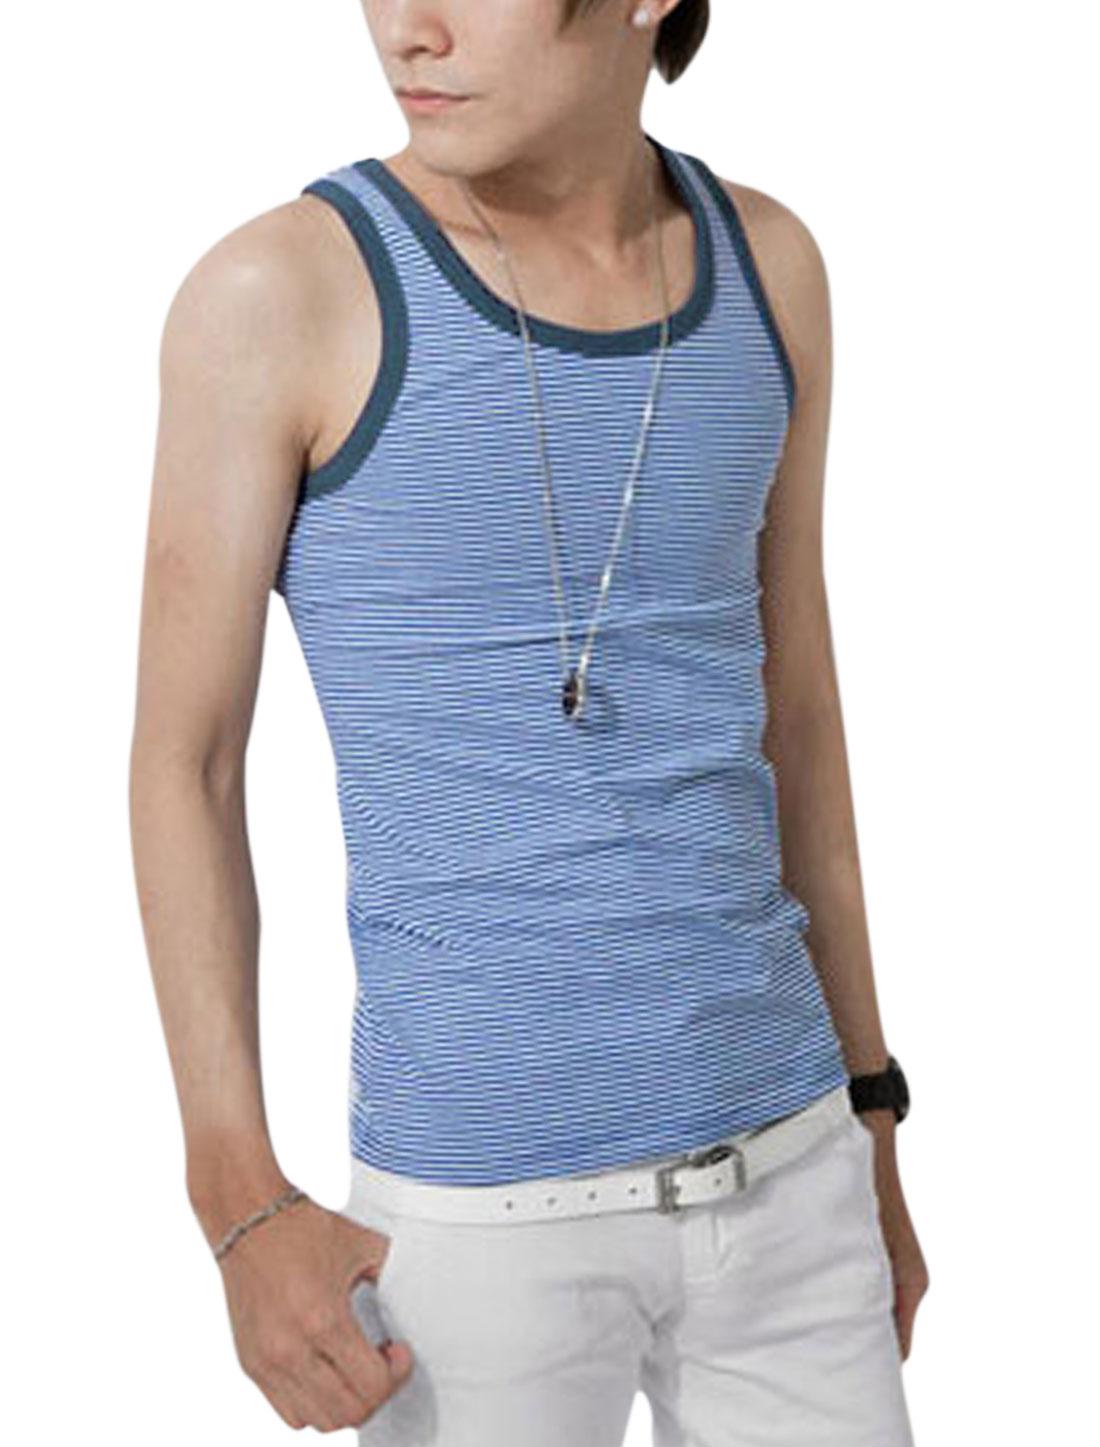 Men's Pullover Stripes Print Summer Fit Tank Top Blue White S